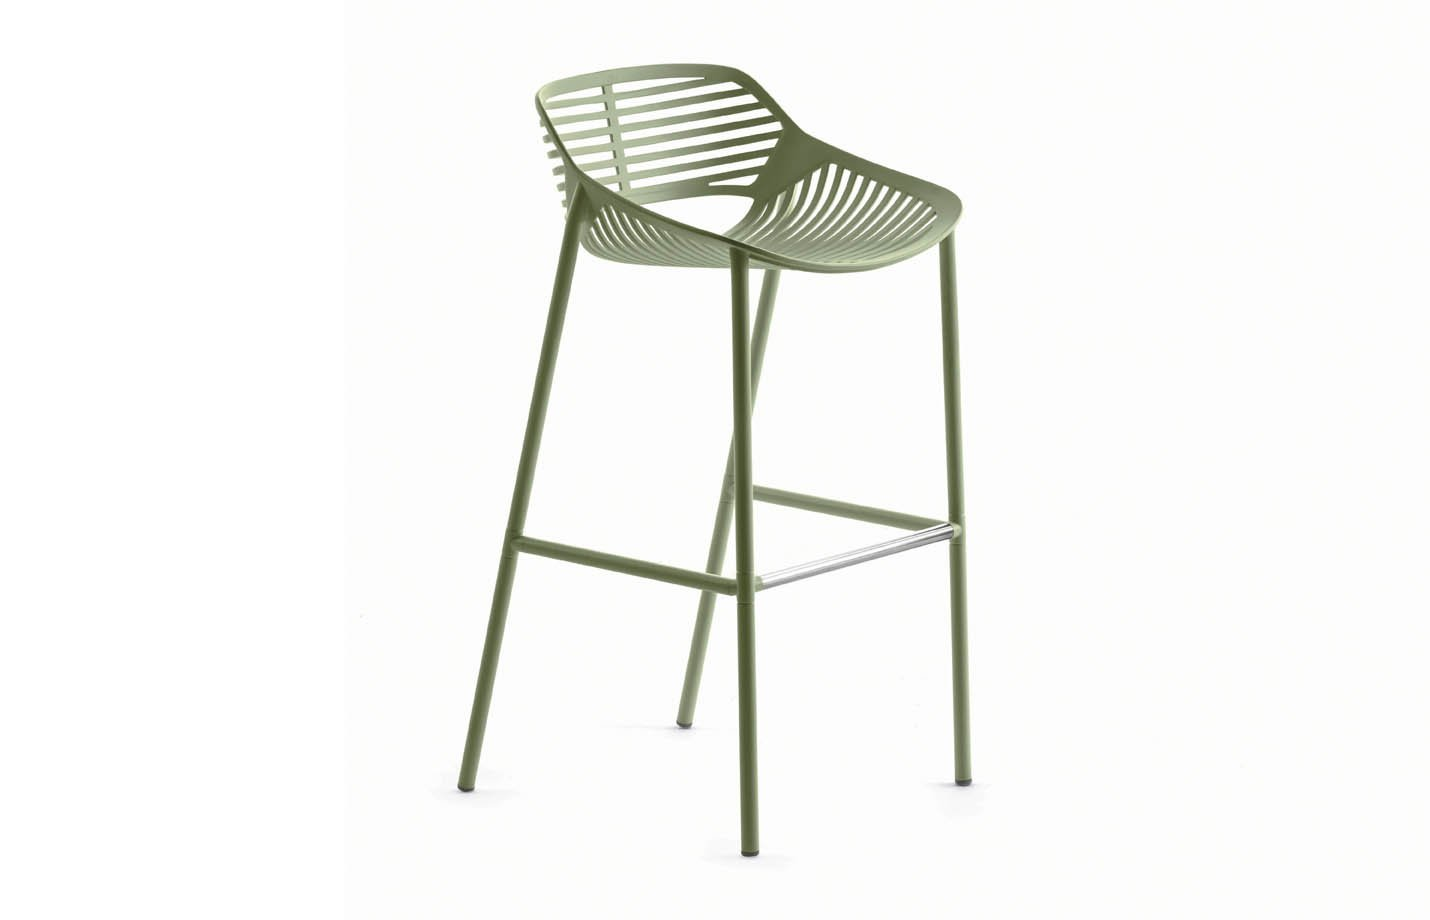 stool chair dubai covers rentals for weddings niwa bar   fabiia - dubai, uae